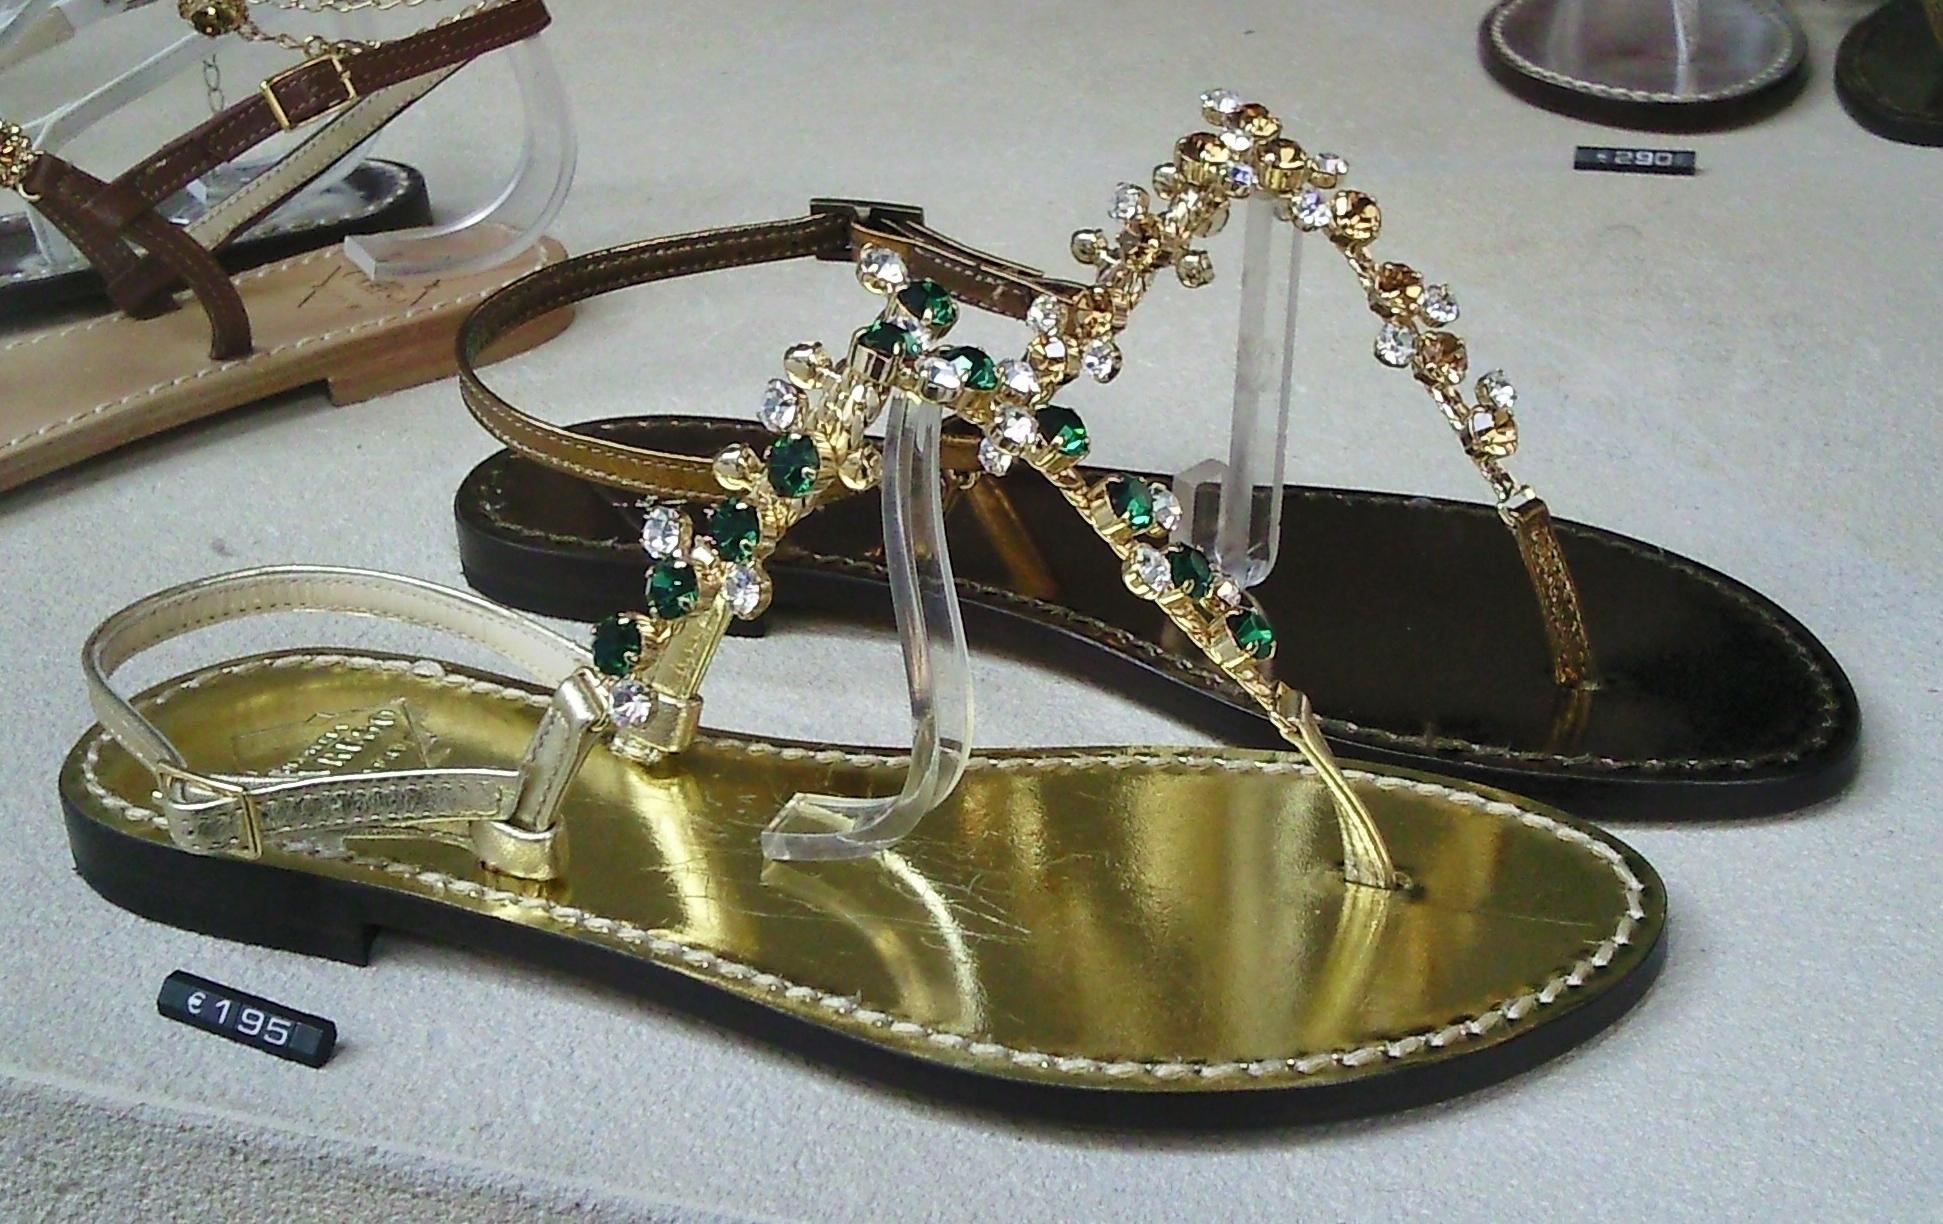 Emanuela Caruso flat sandals – The Fashion Cat 58822e0457e